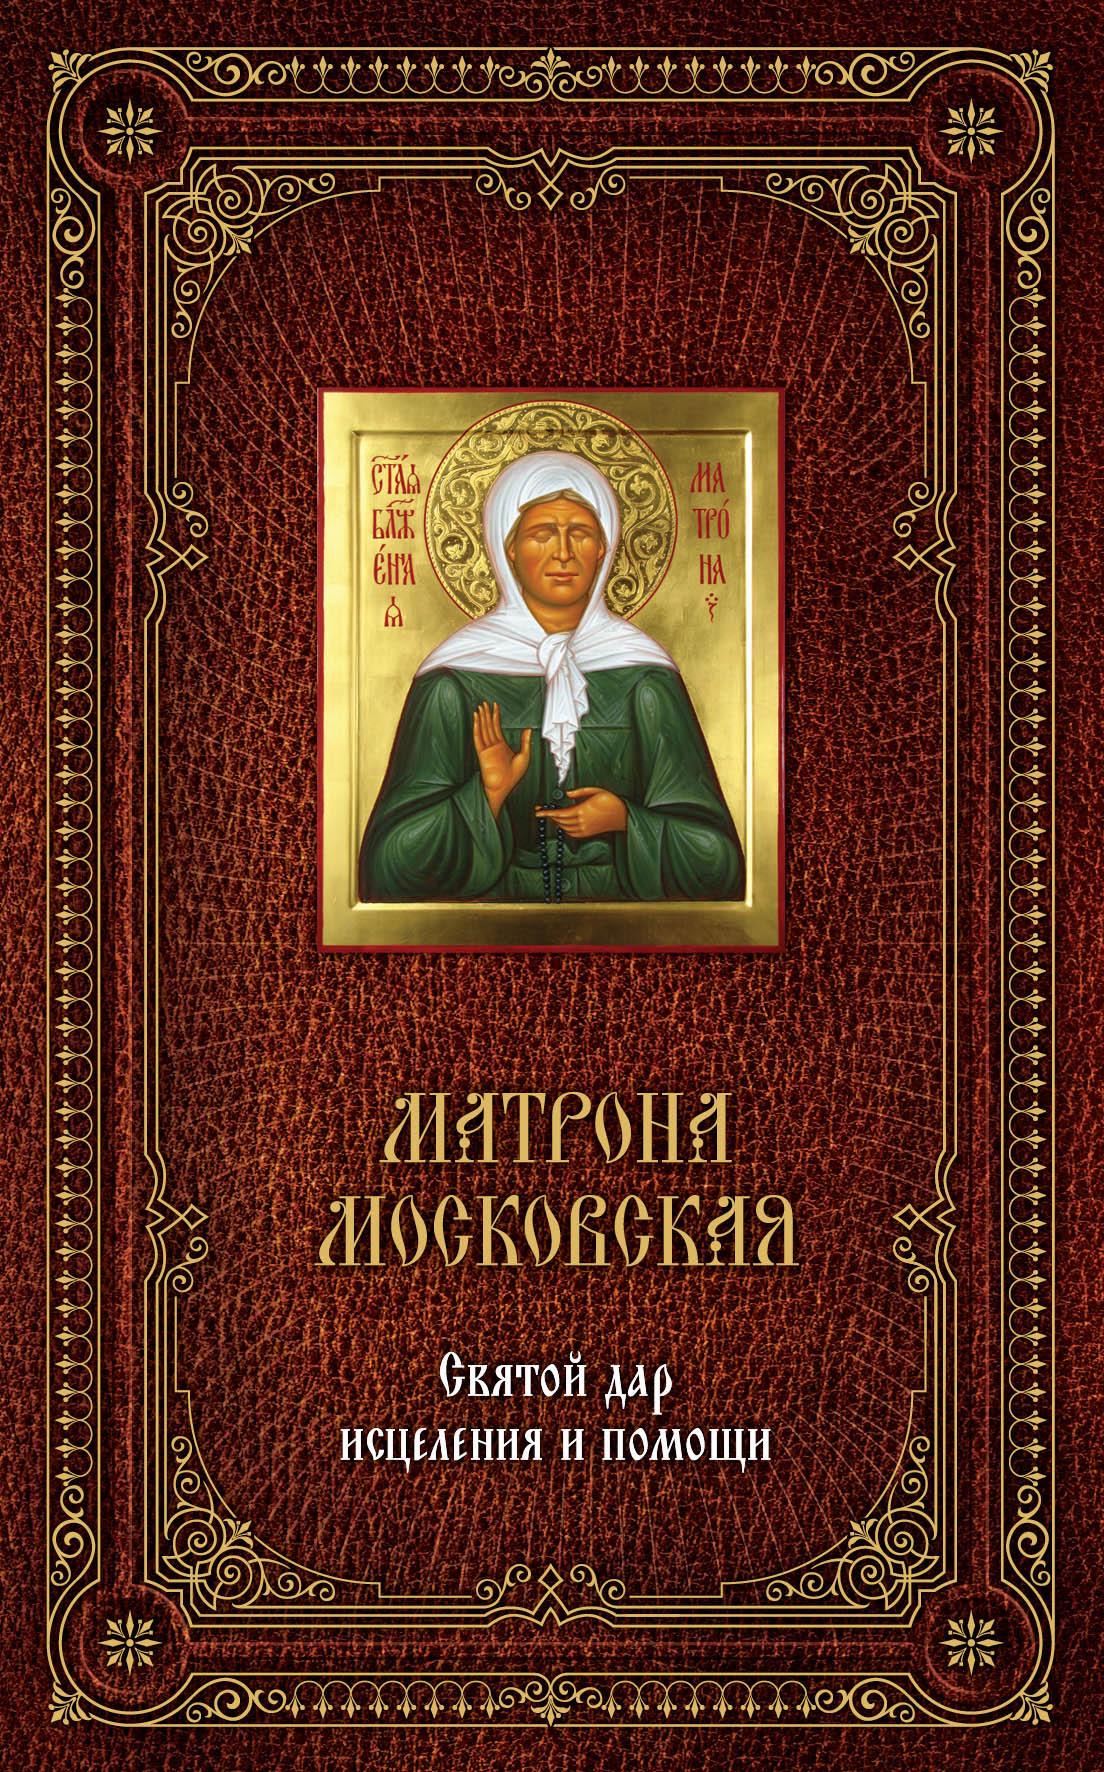 Матрона Московская: Святой дар исцеления и помощи. [книга и икона в футляре] (нов.ИСБН) икона святой никита